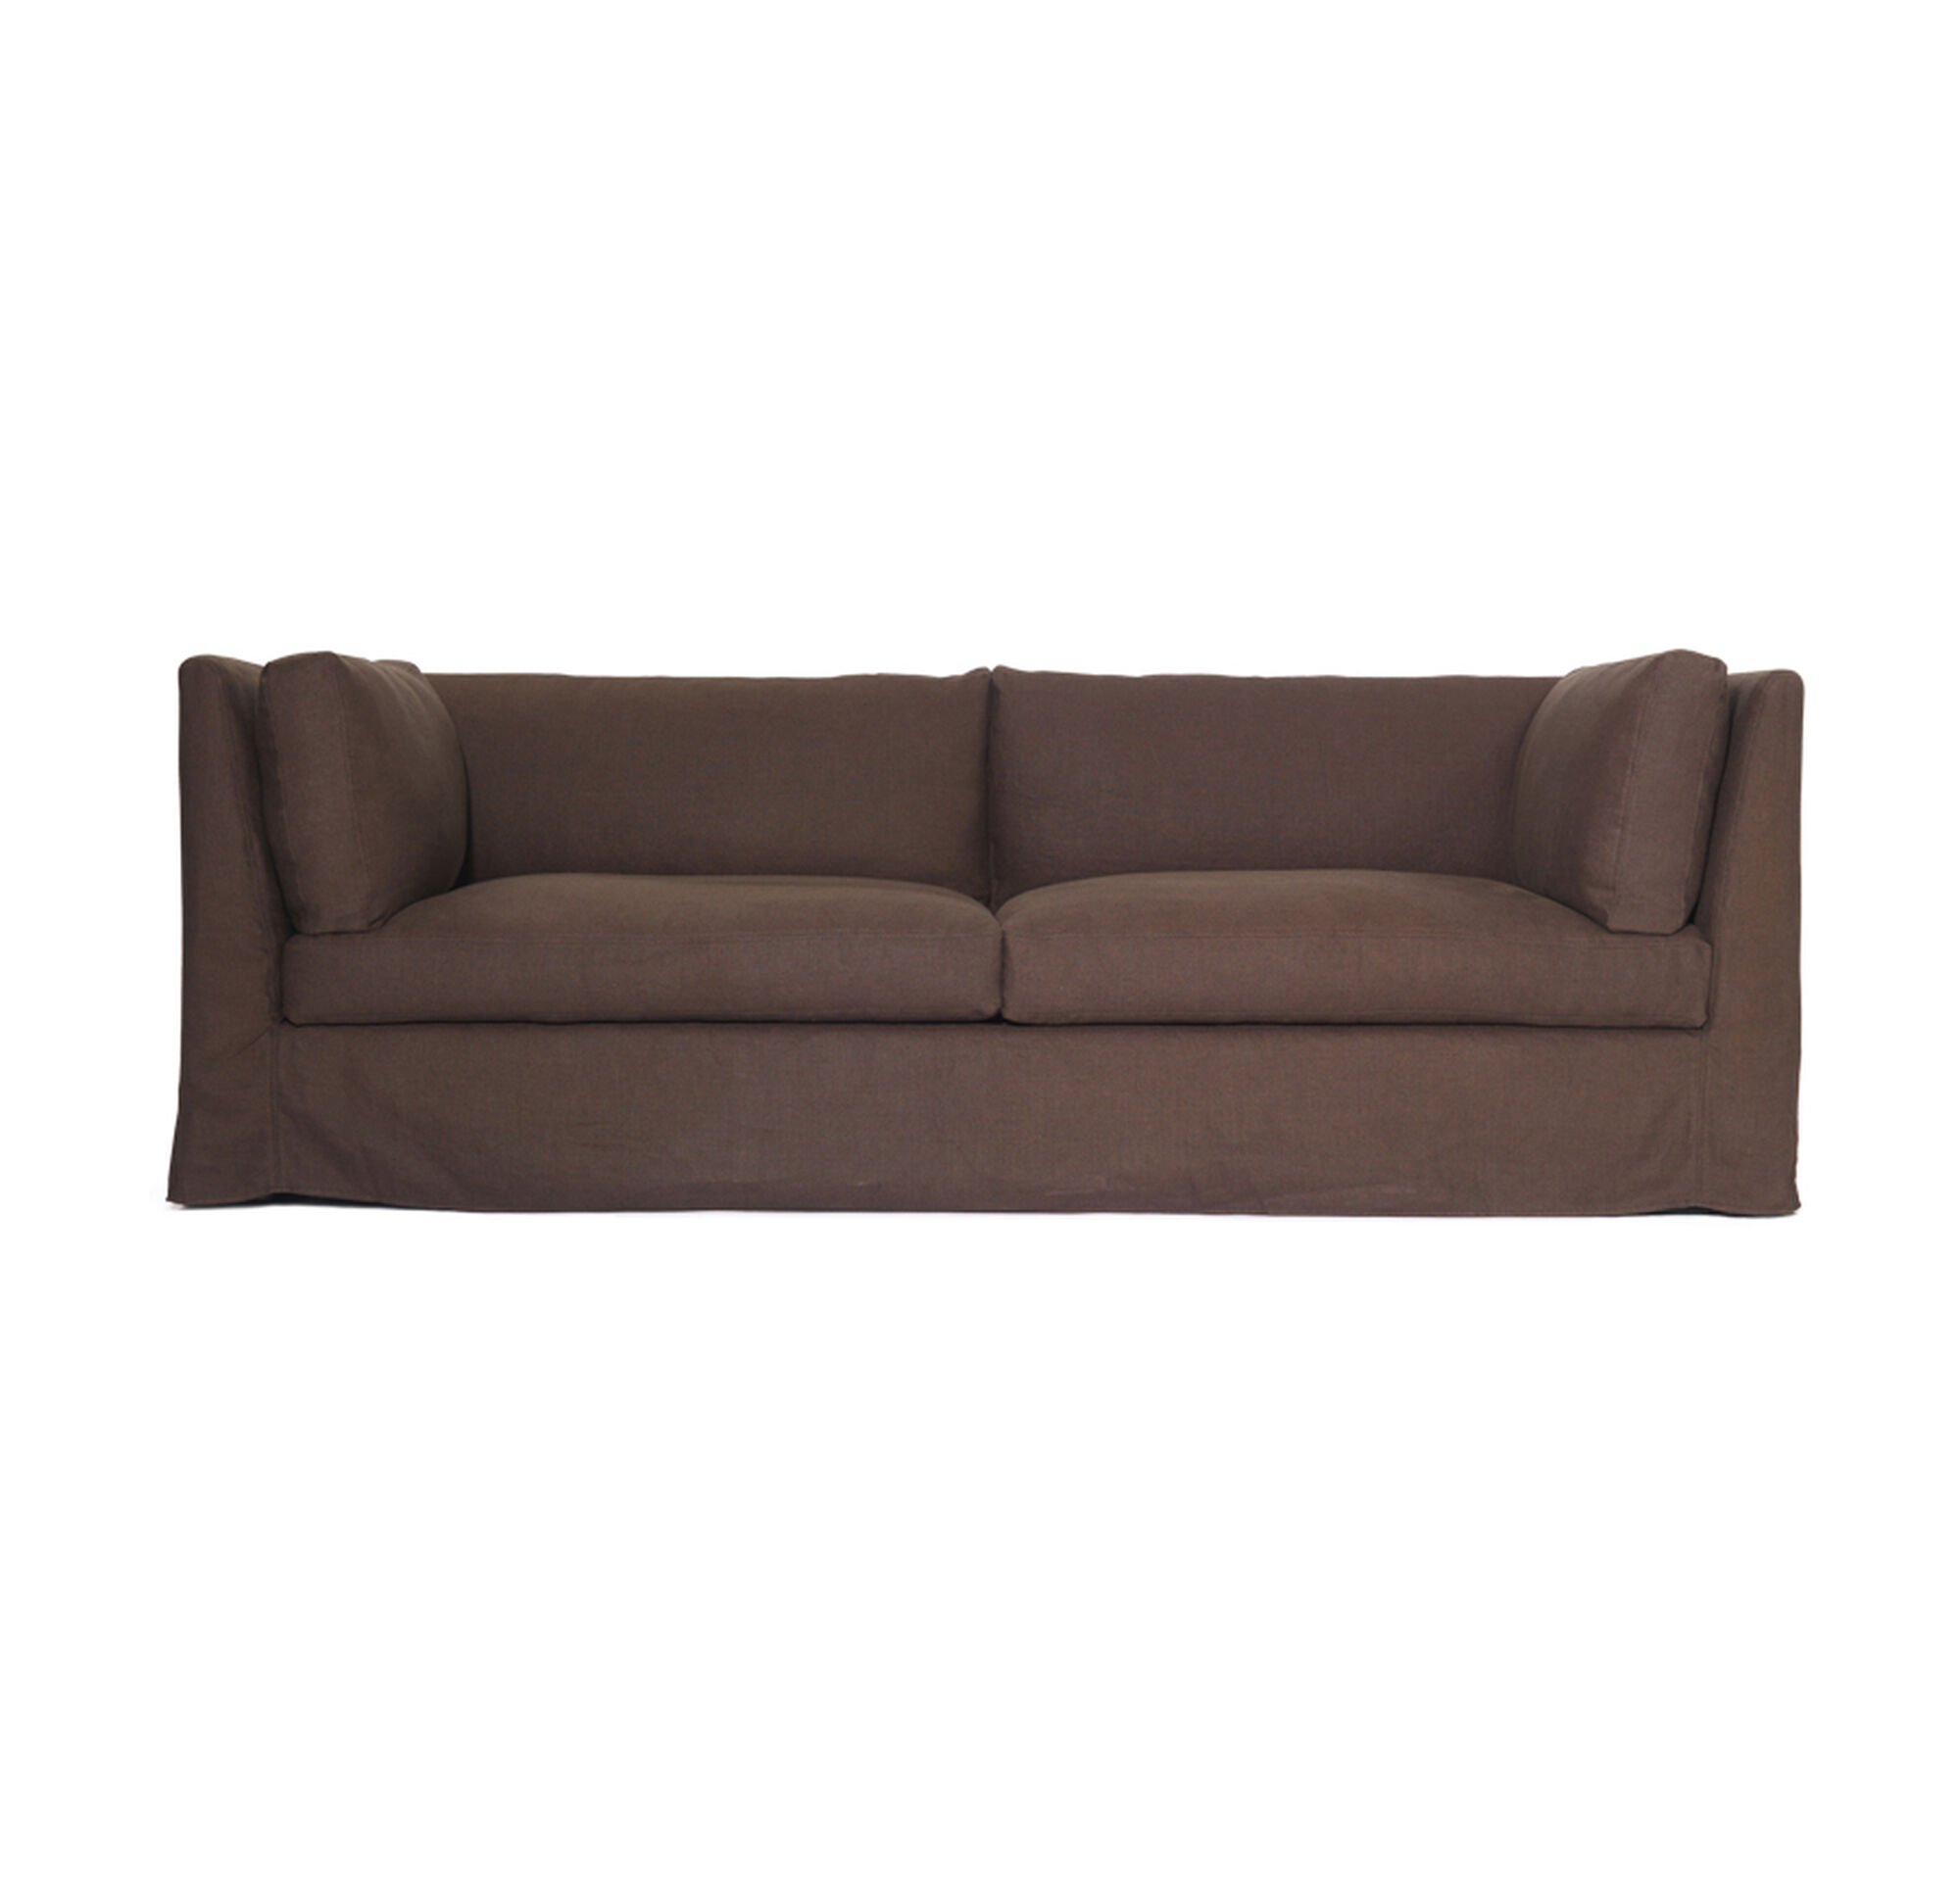 franco slipcover sofa. Black Bedroom Furniture Sets. Home Design Ideas